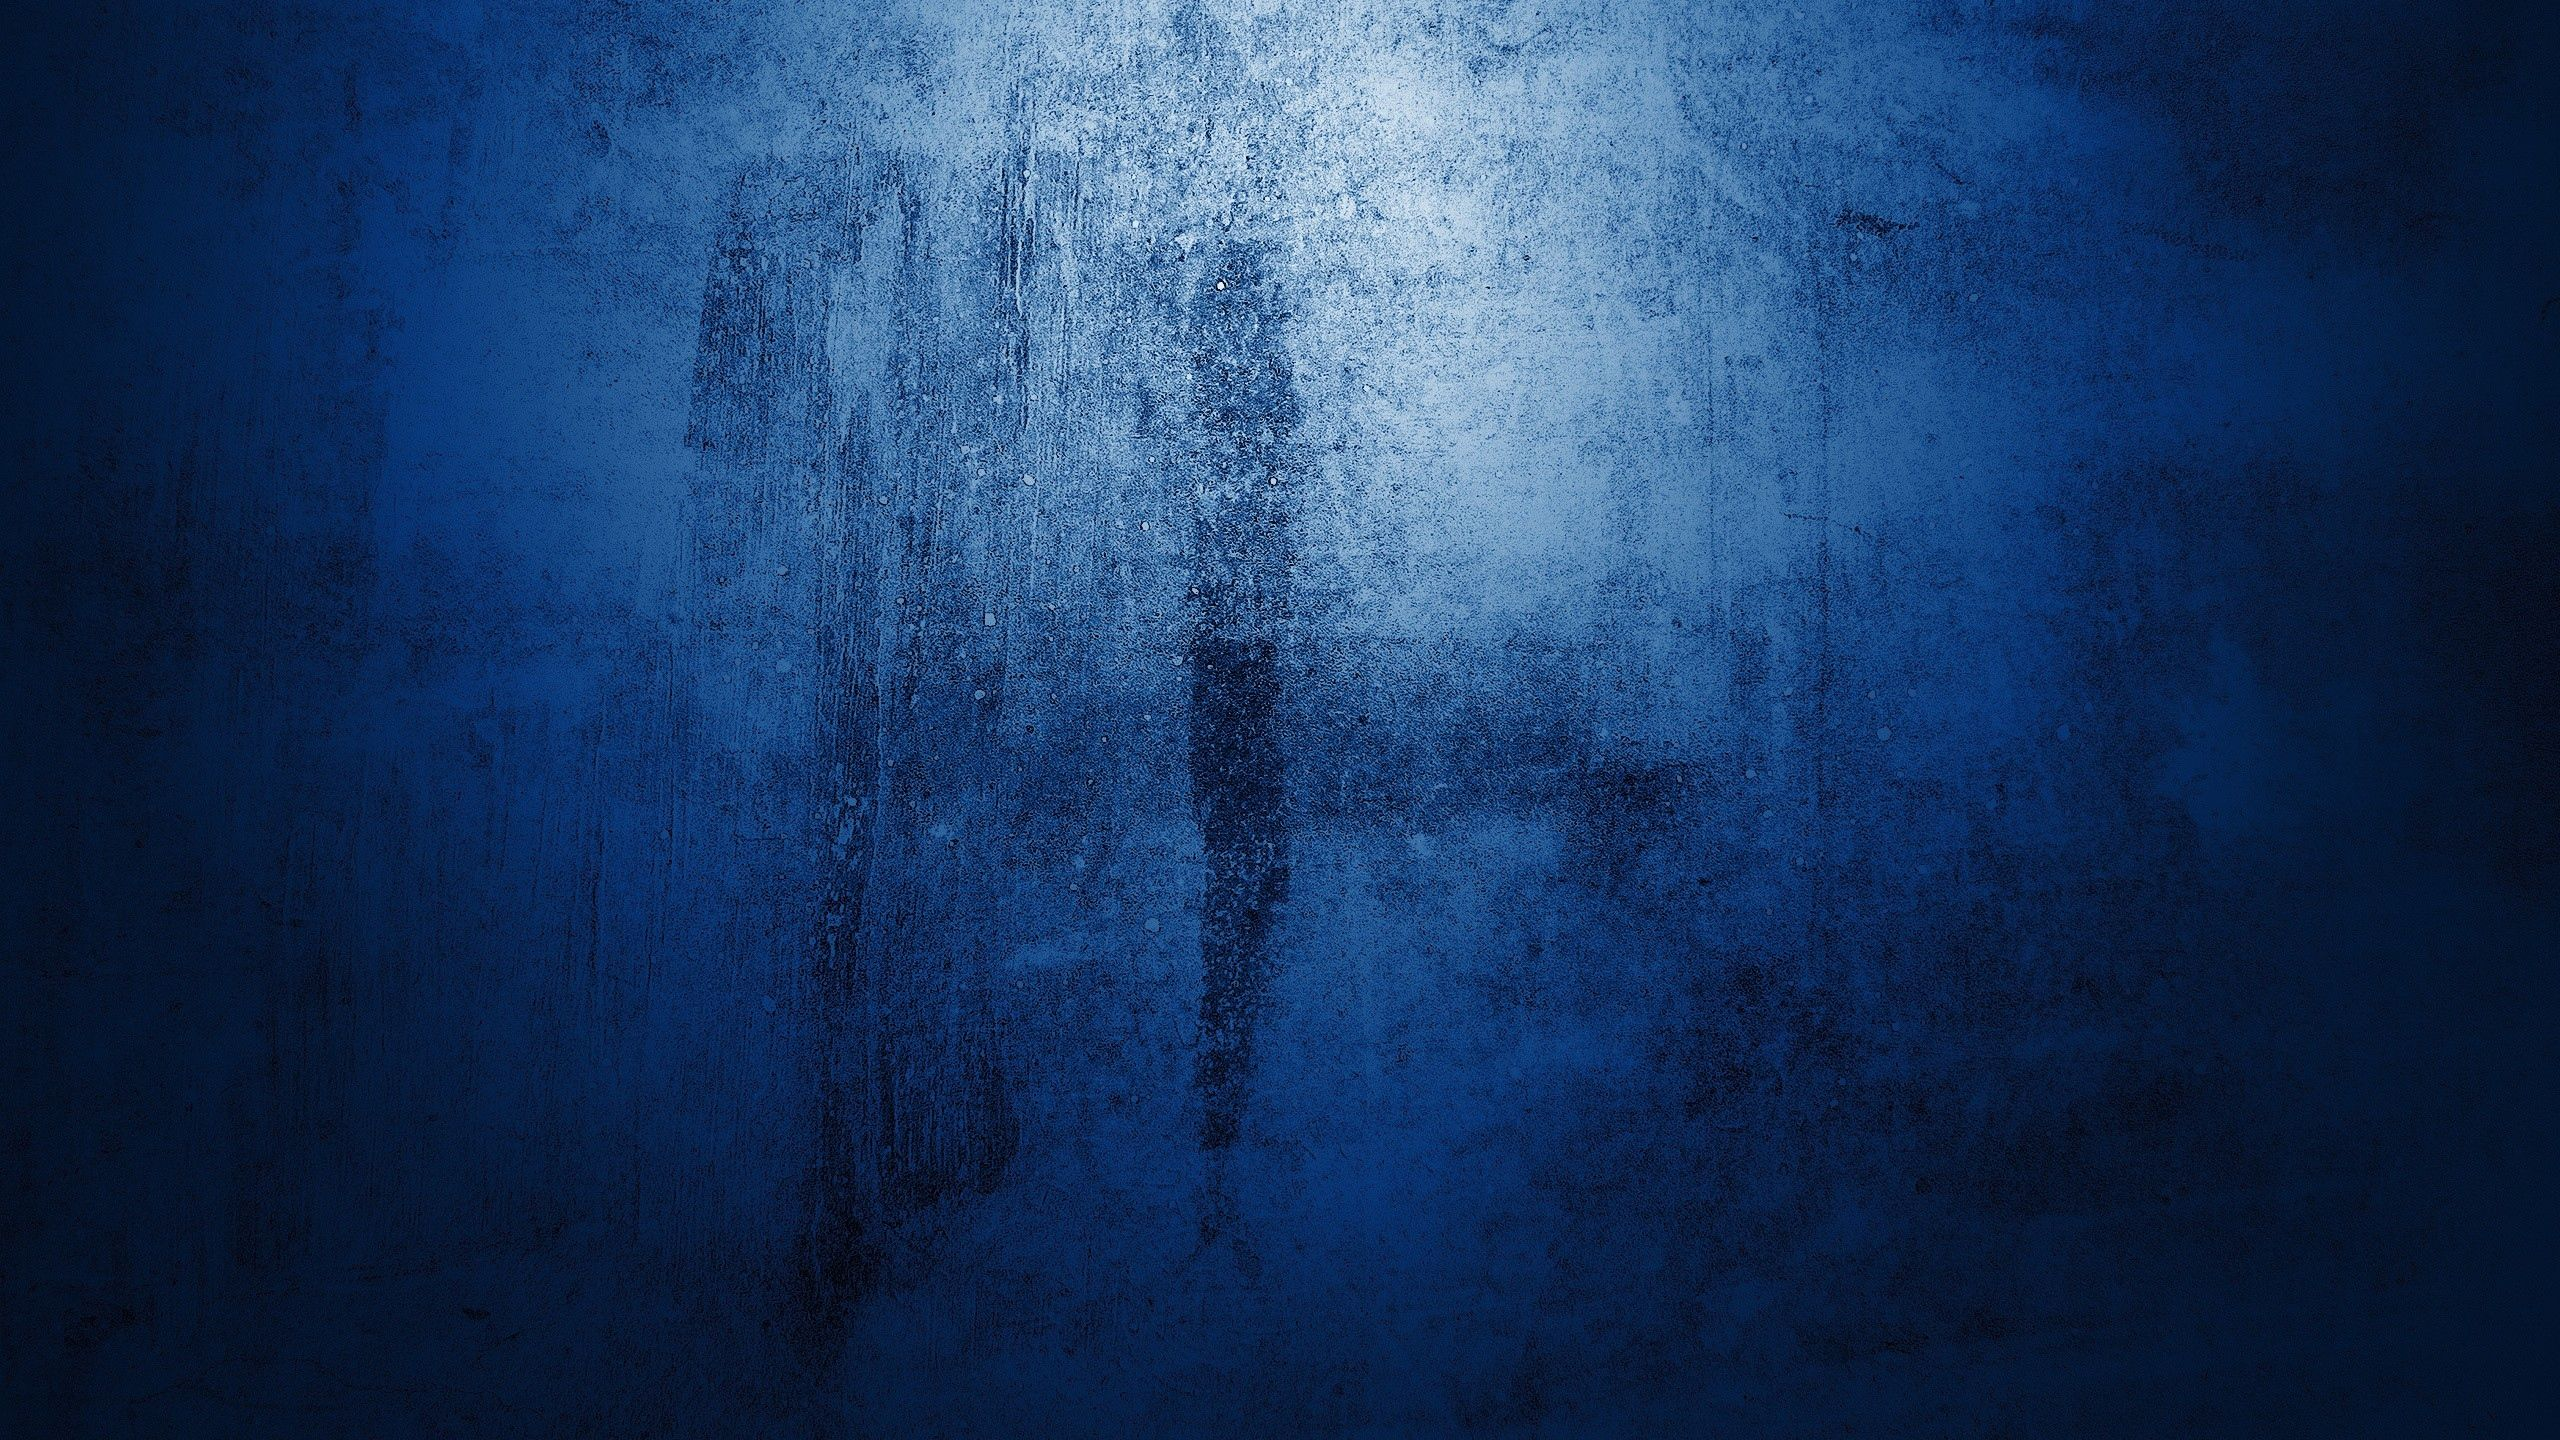 blue, blob, paint, matt Papel de parede texturizado